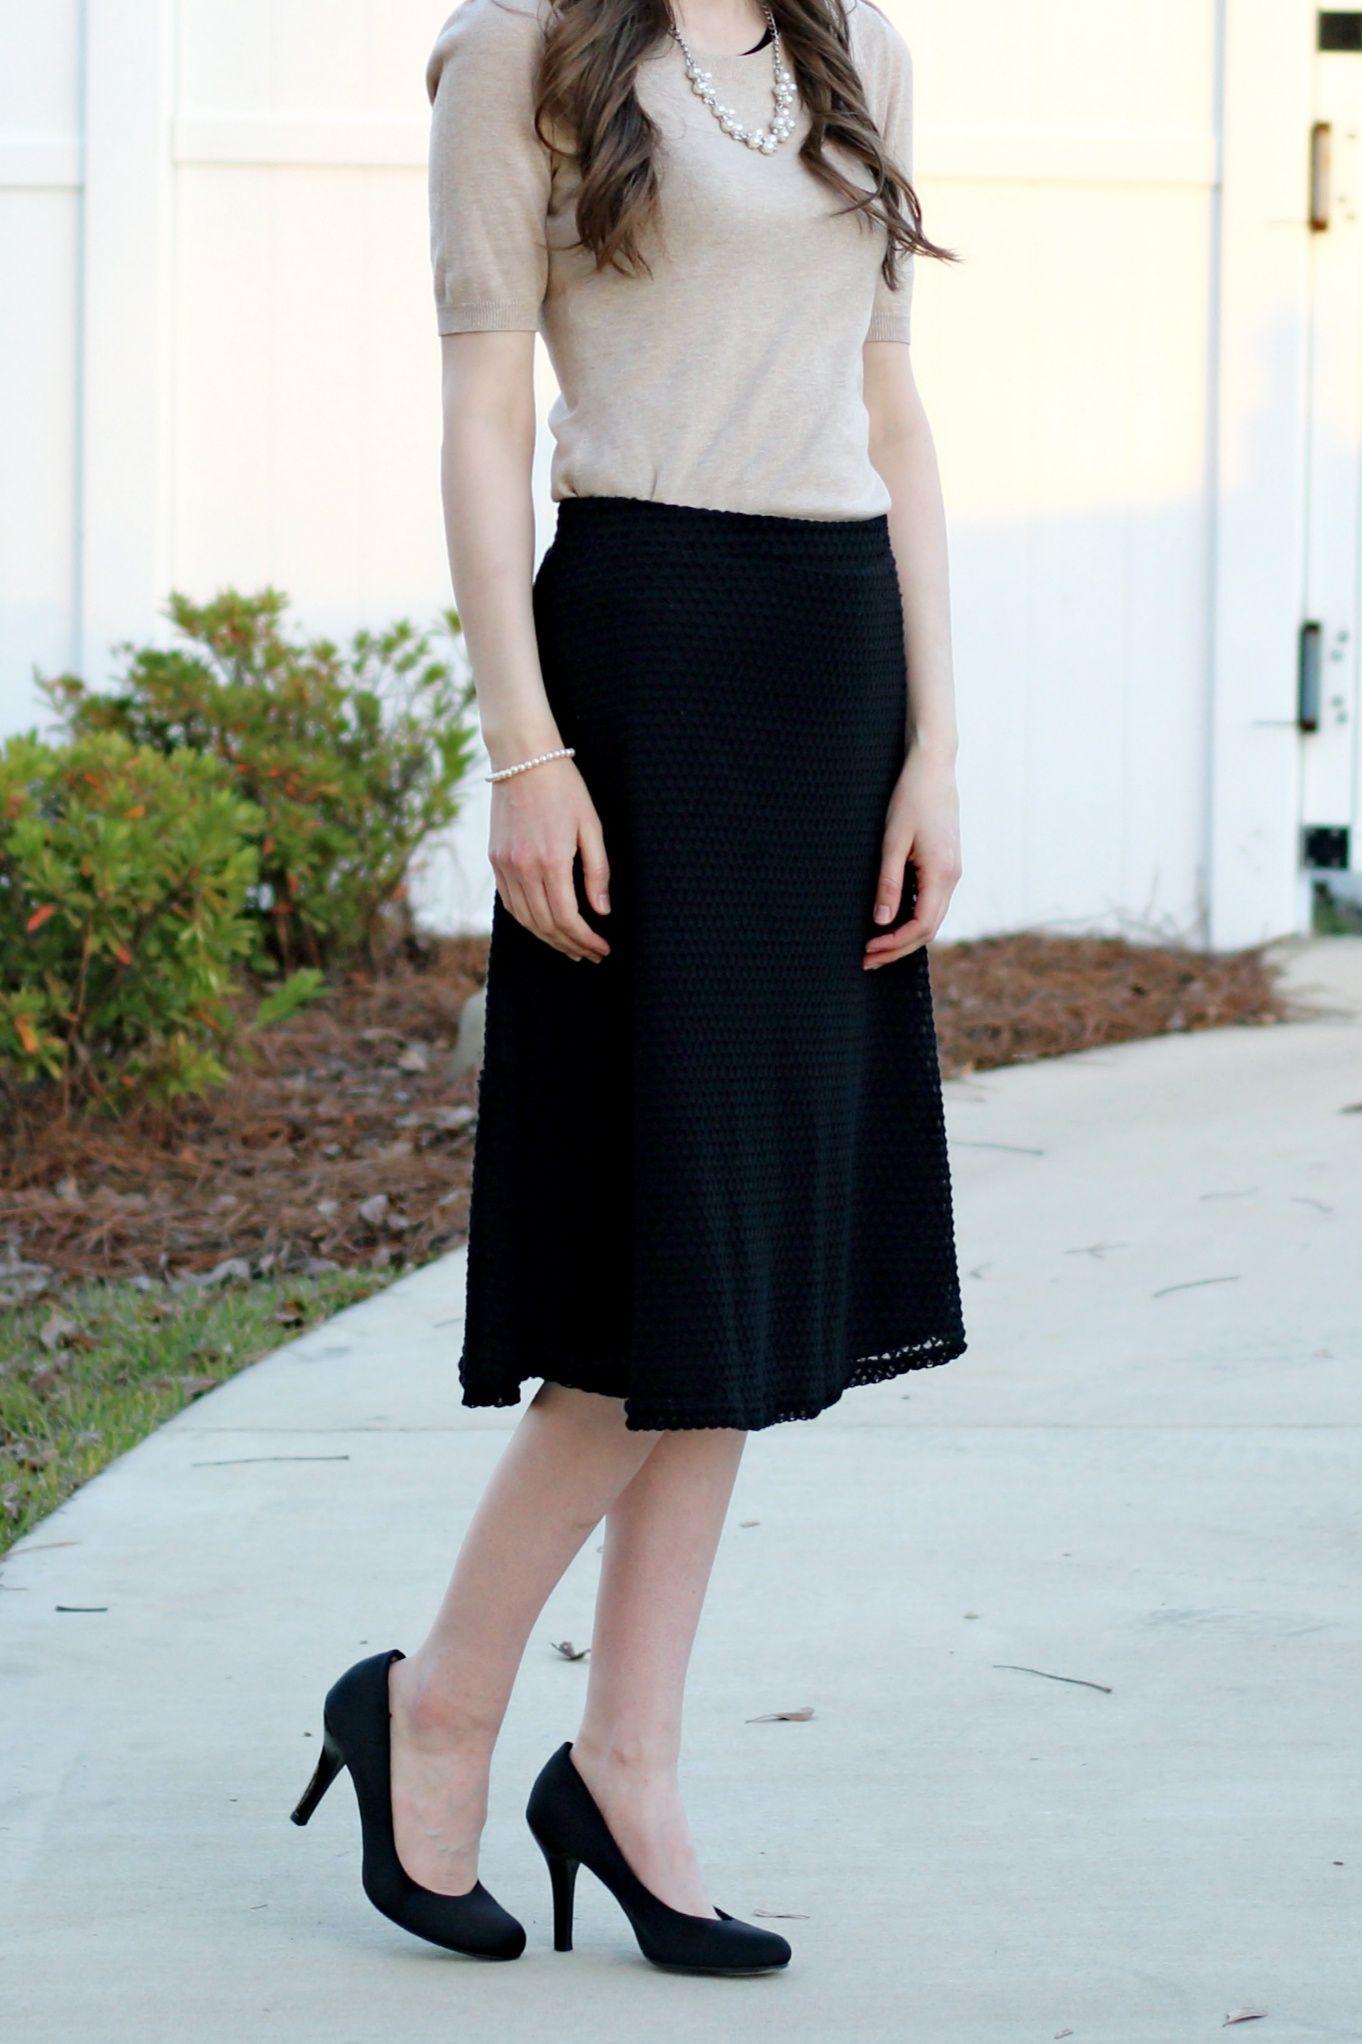 Modest Outfit Idea//Black Midi Skirt//Tan Sweater//Black Heels